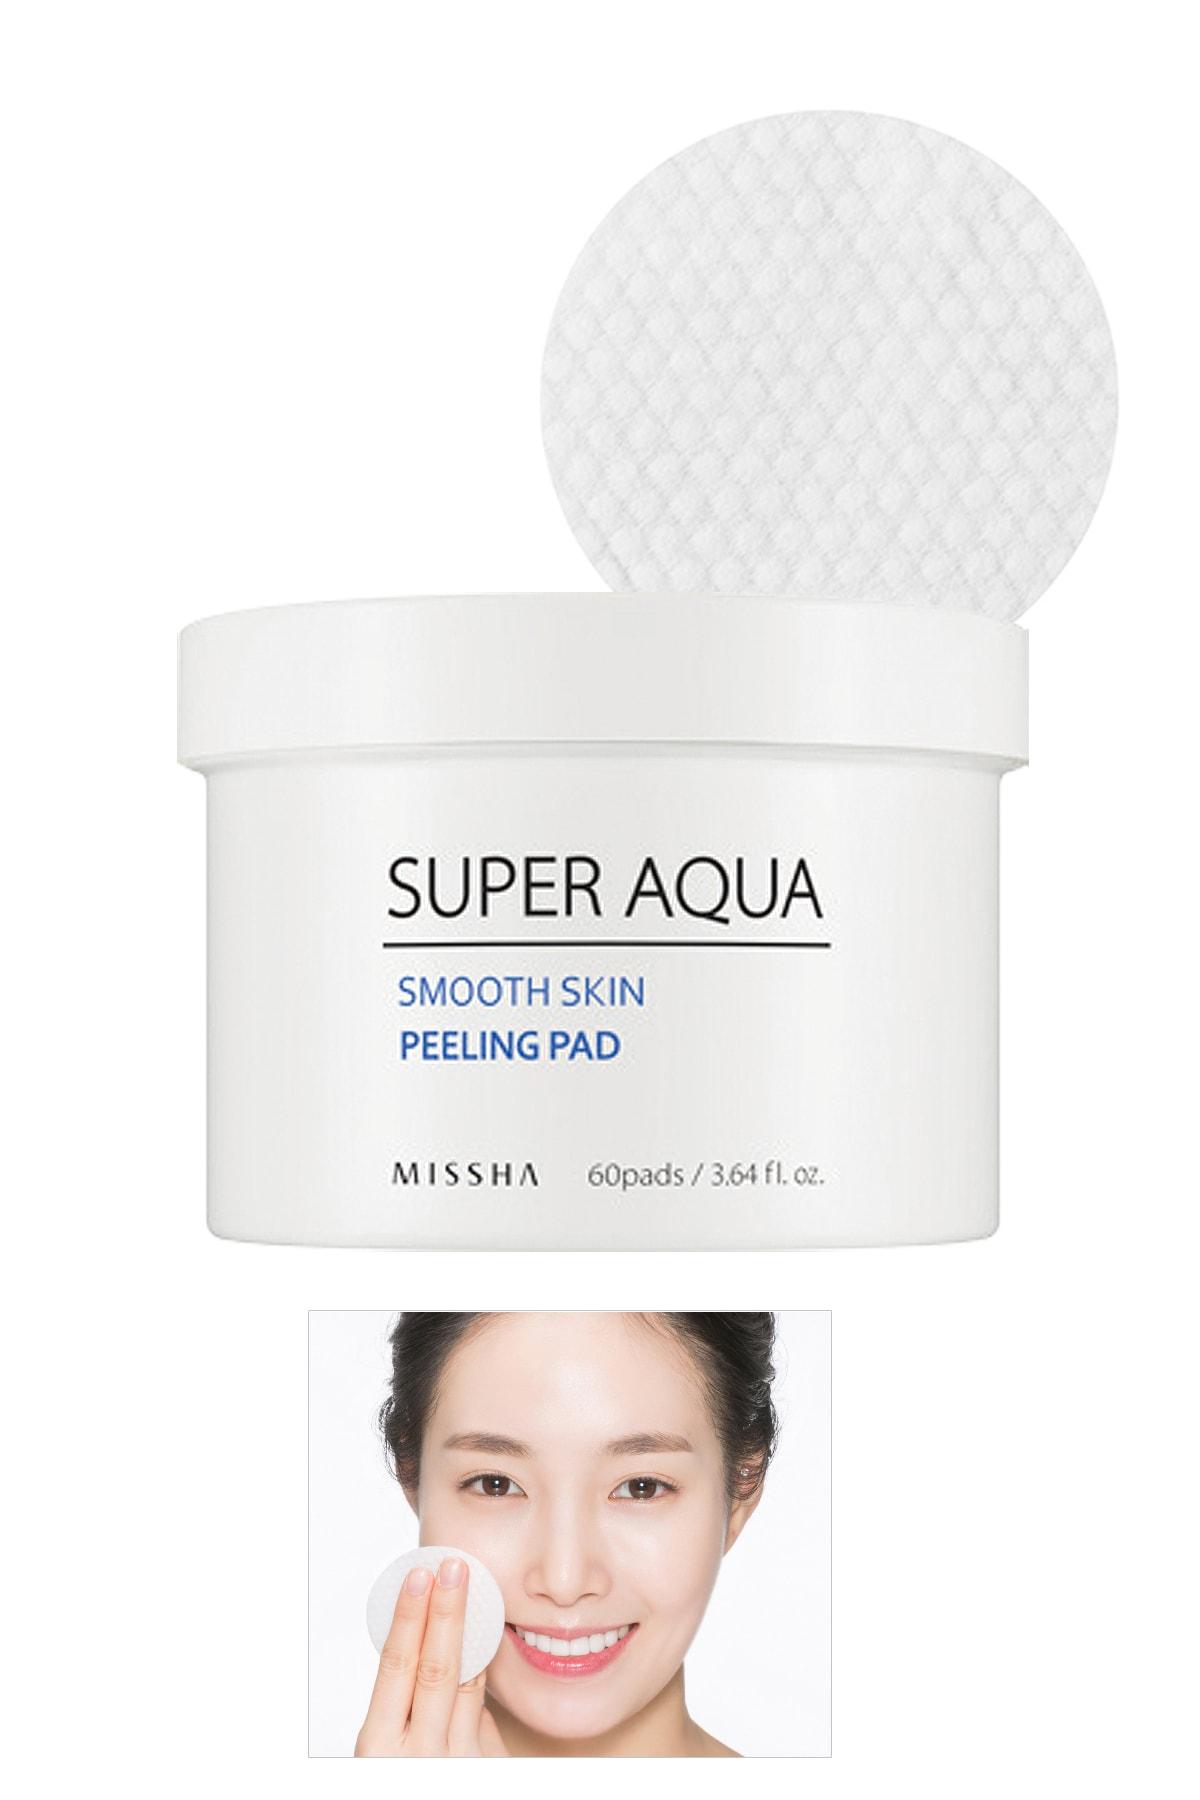 AHA BHA İçeren Pürüzsüz Görünüm Sunan Günlük Peeling Ped (60Adet) Super Aqua Smooth Peeling Pad